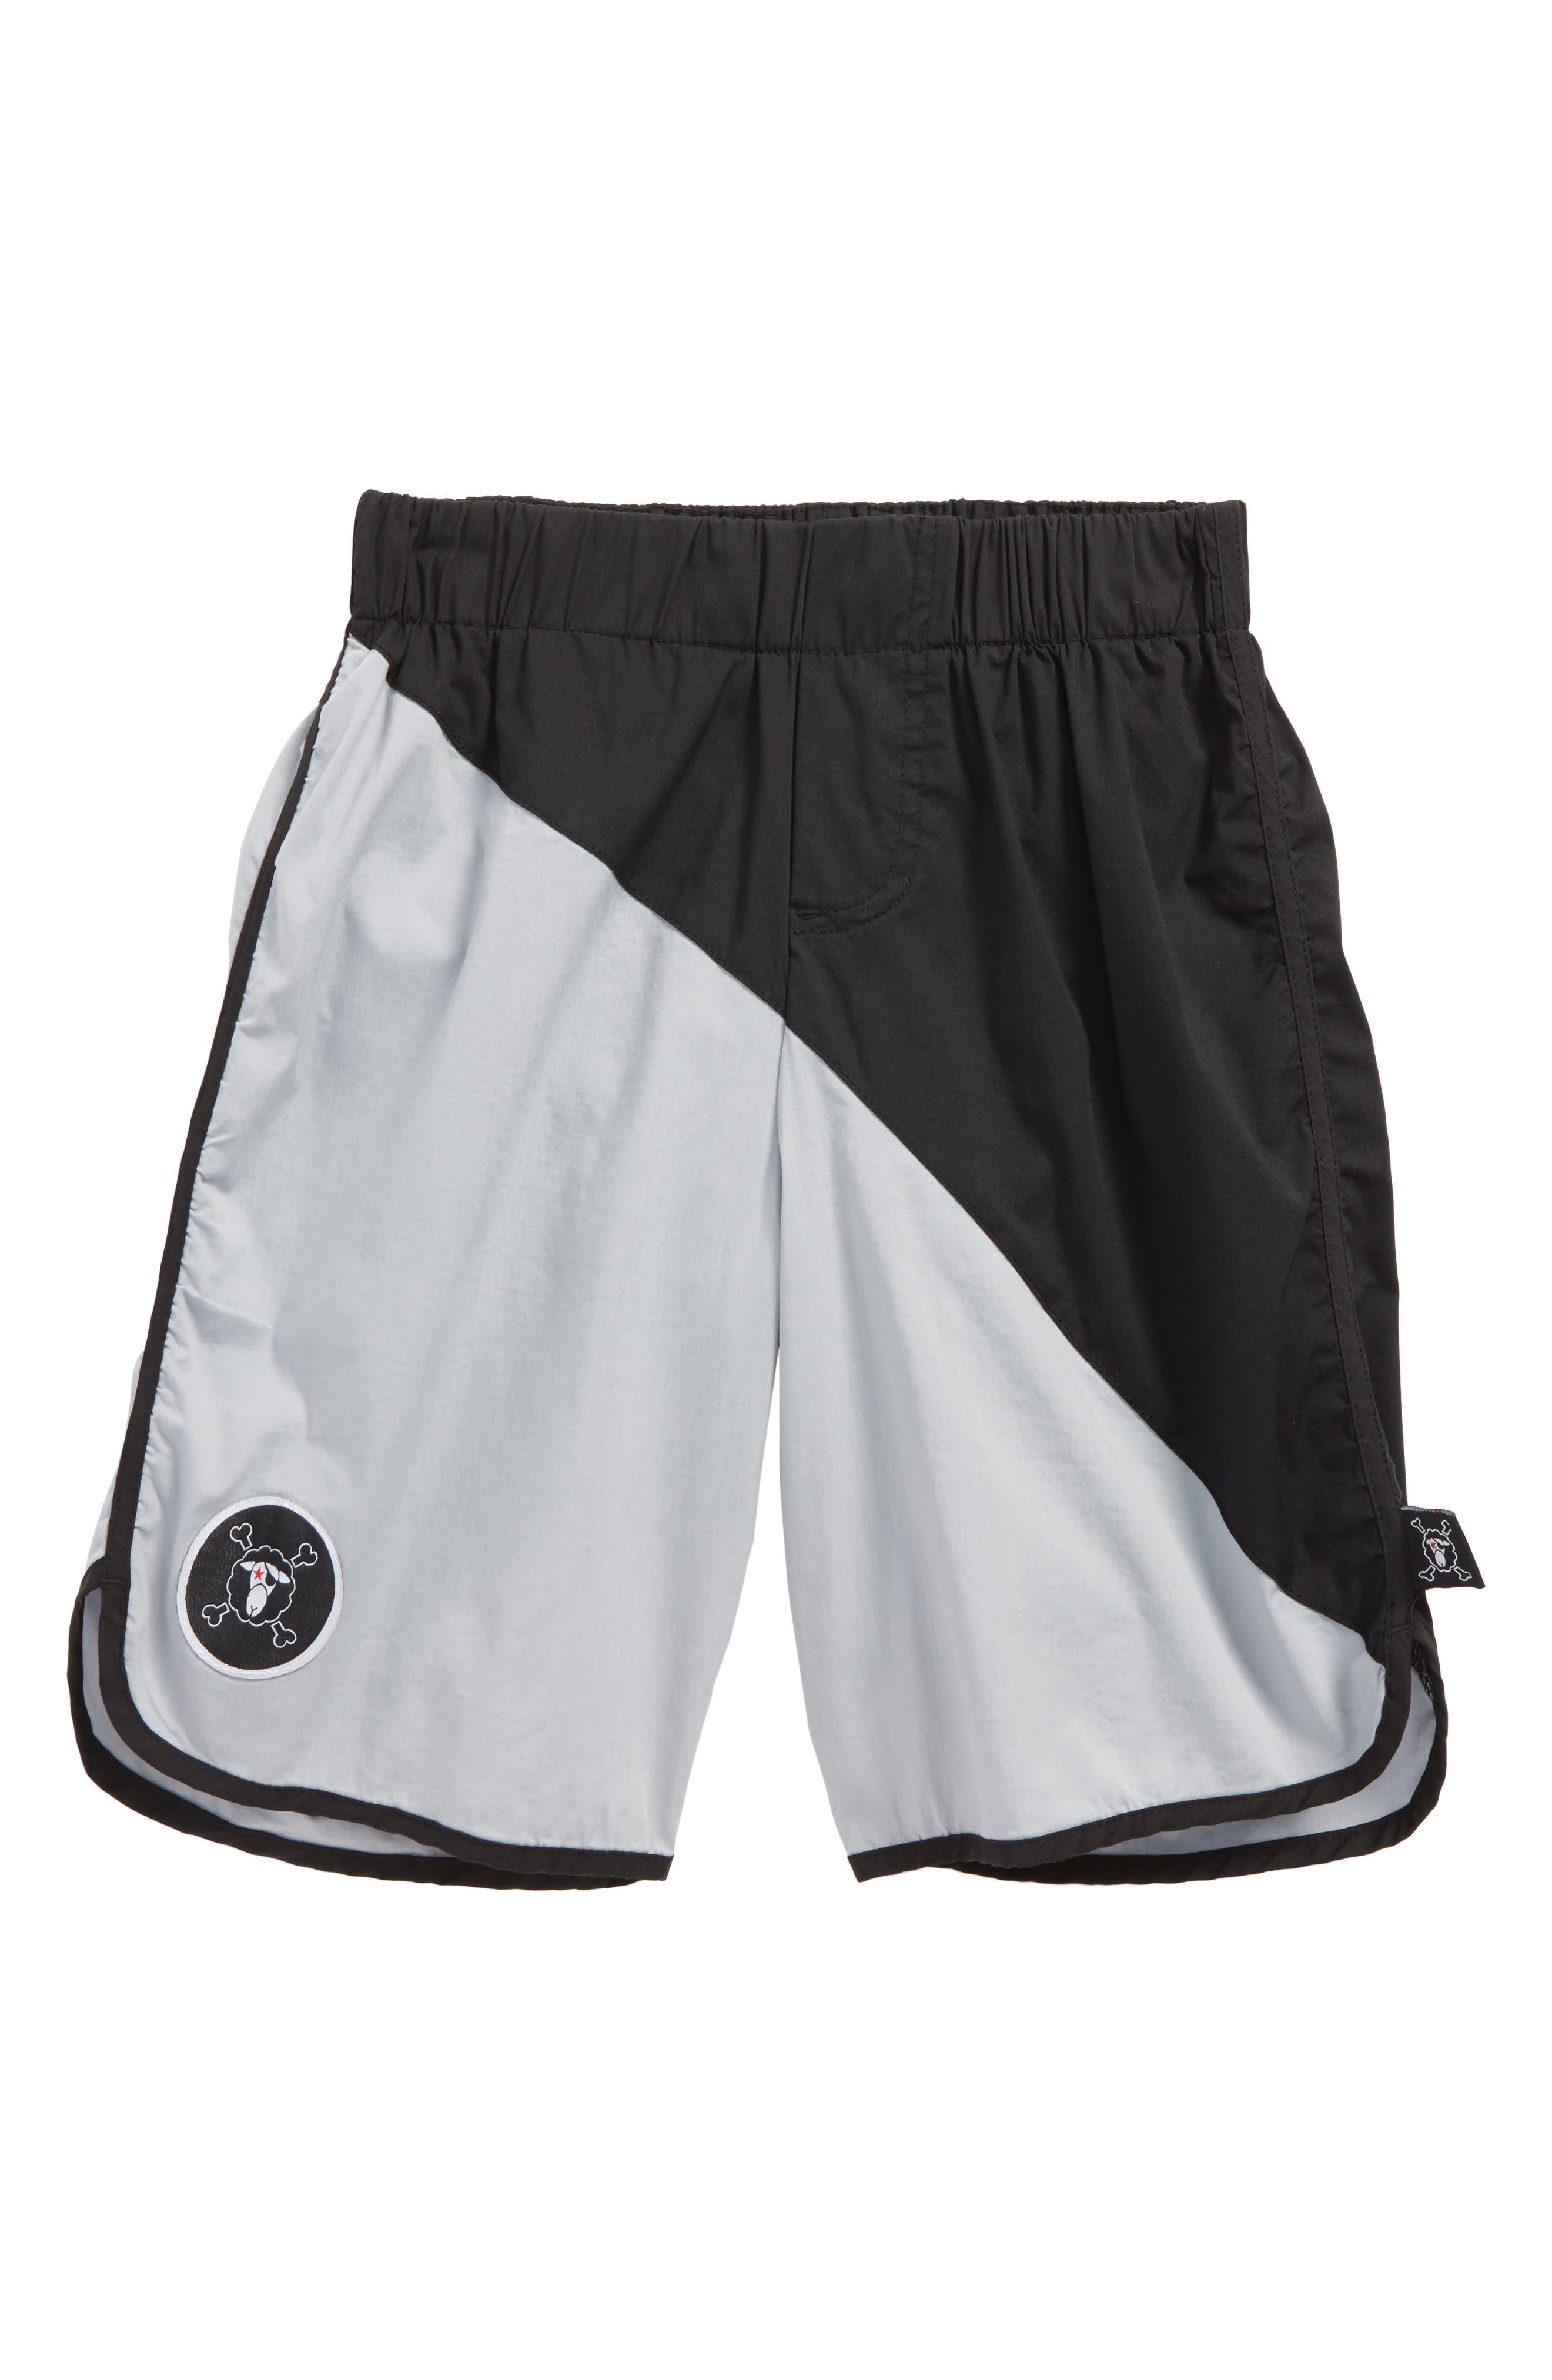 Colorblock Board Shorts,                         Main,                         color, Black/ Light Grey